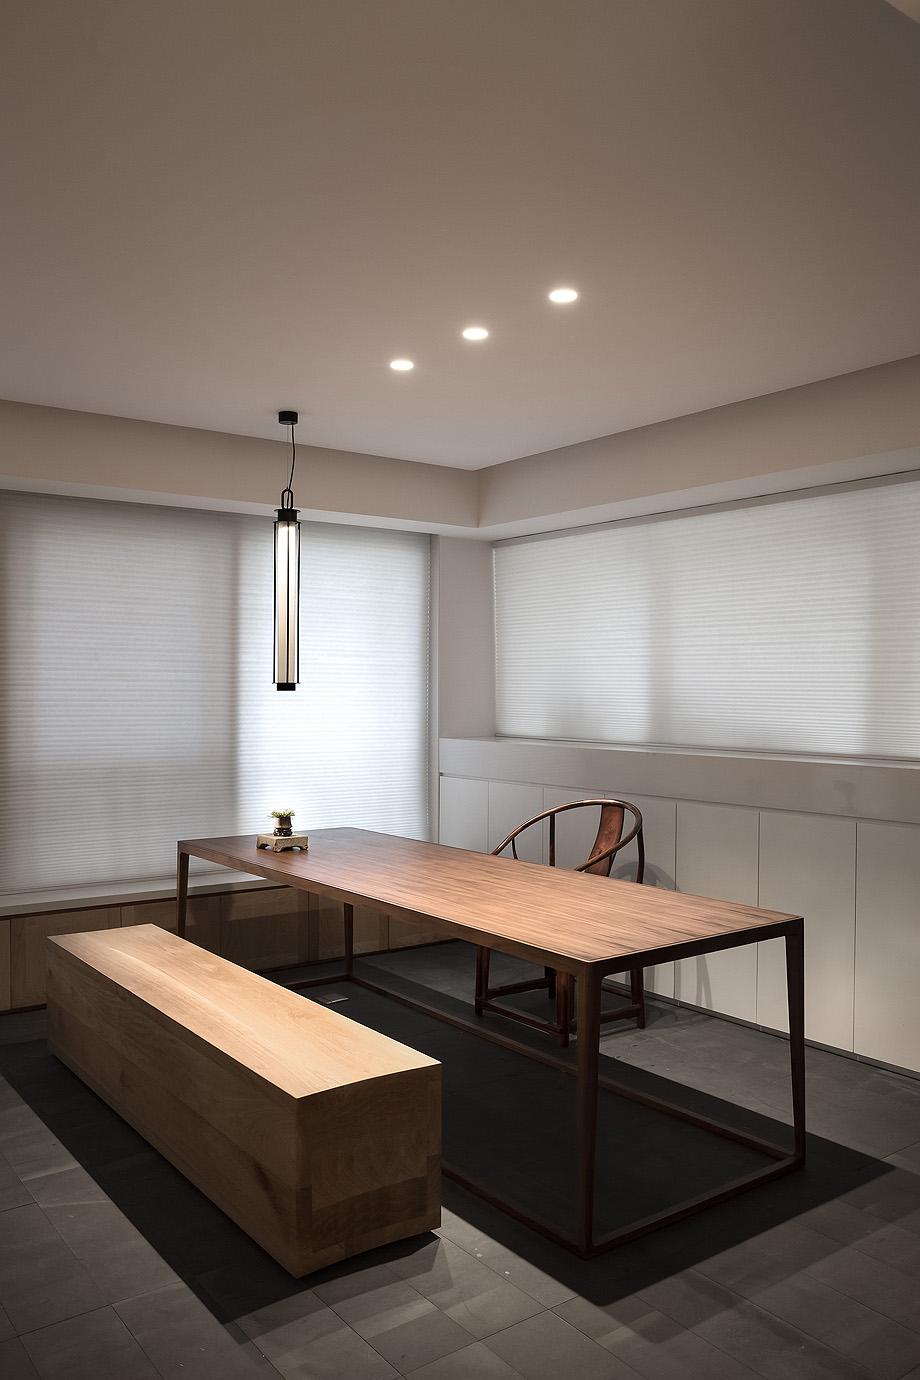 vivienda de ad architecture - foto ouyang yun (7)